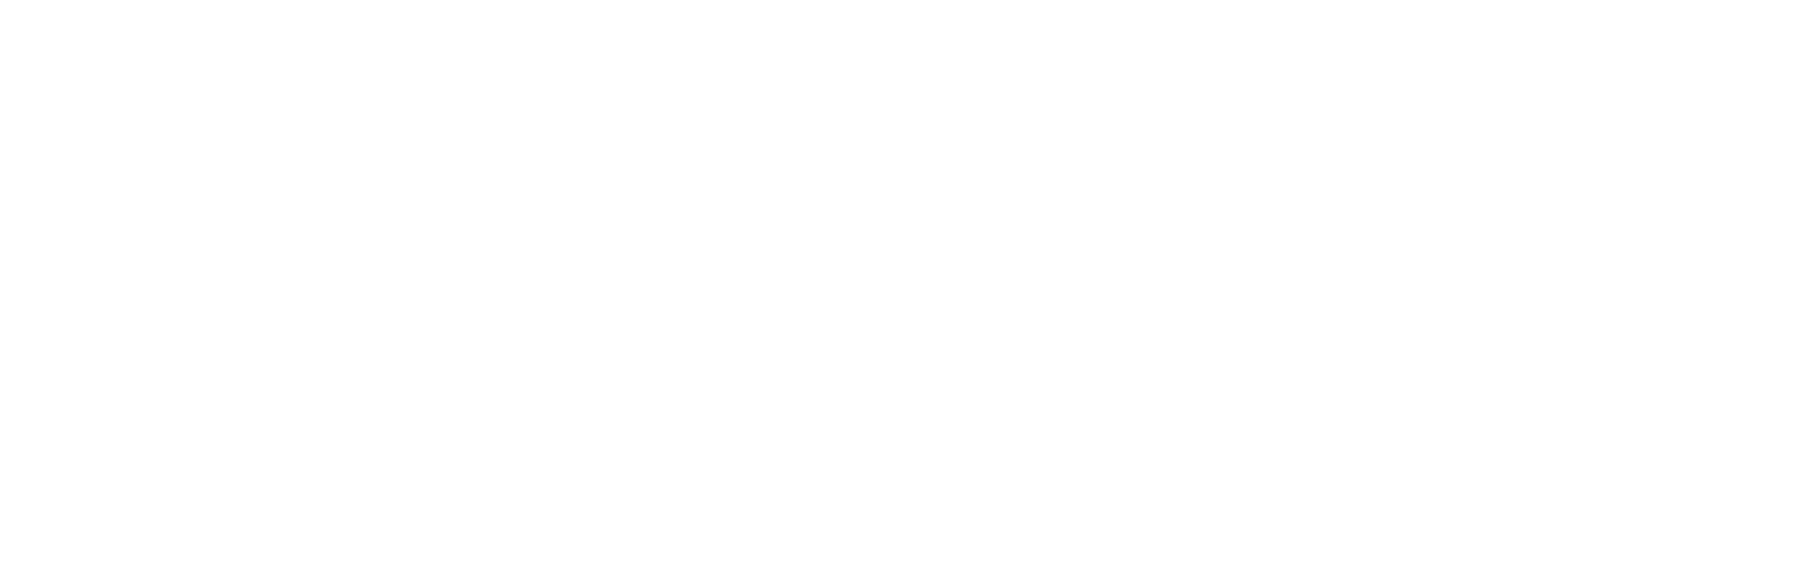 The Office – Business Center Monaco